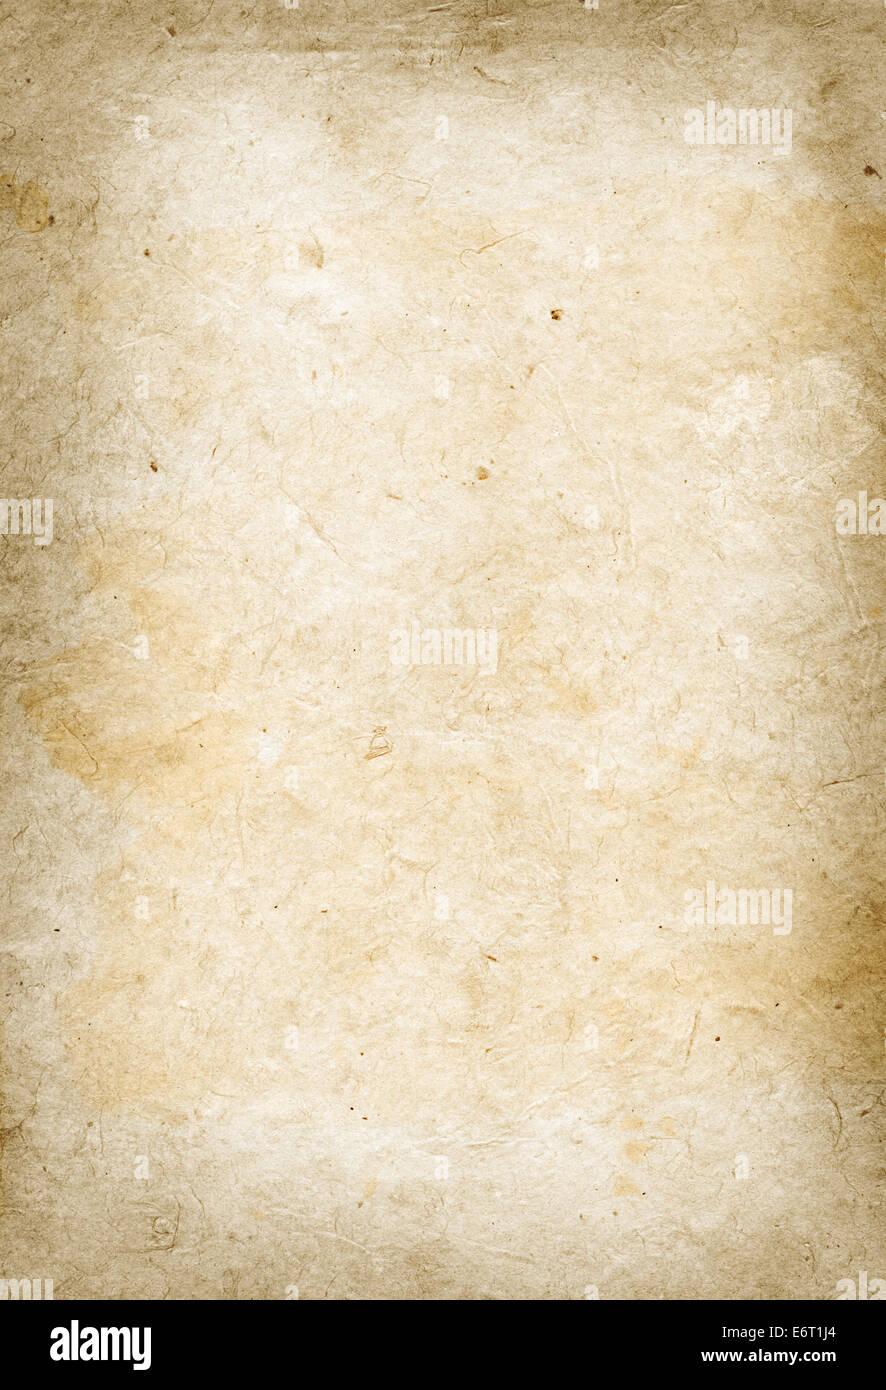 old parchment paper texture stock photo 73057548 alamy